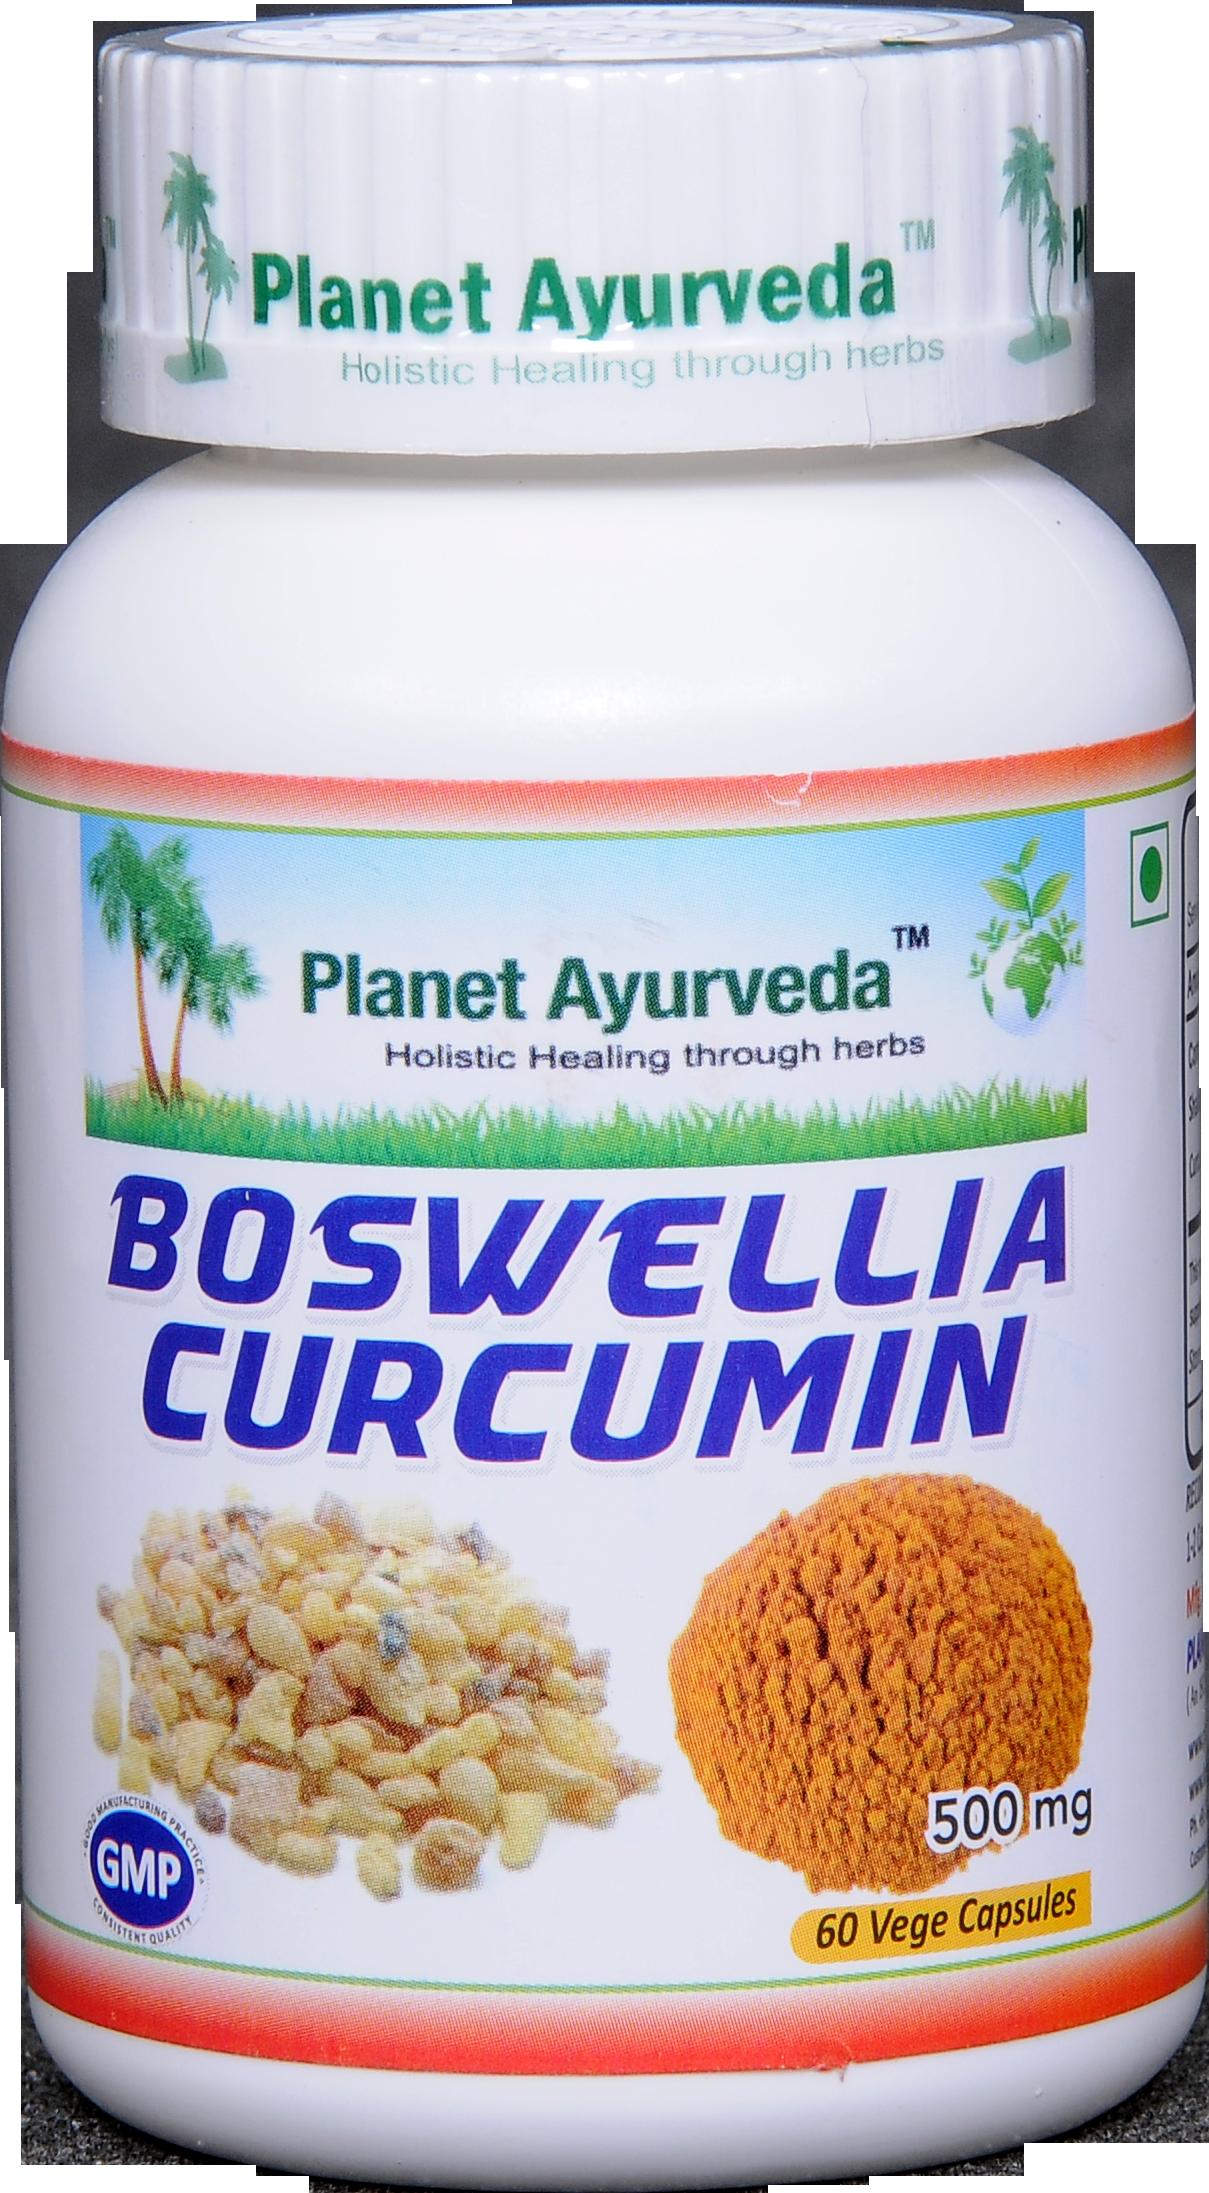 Boswellia-Curcumin kapsuly planet ayurveda